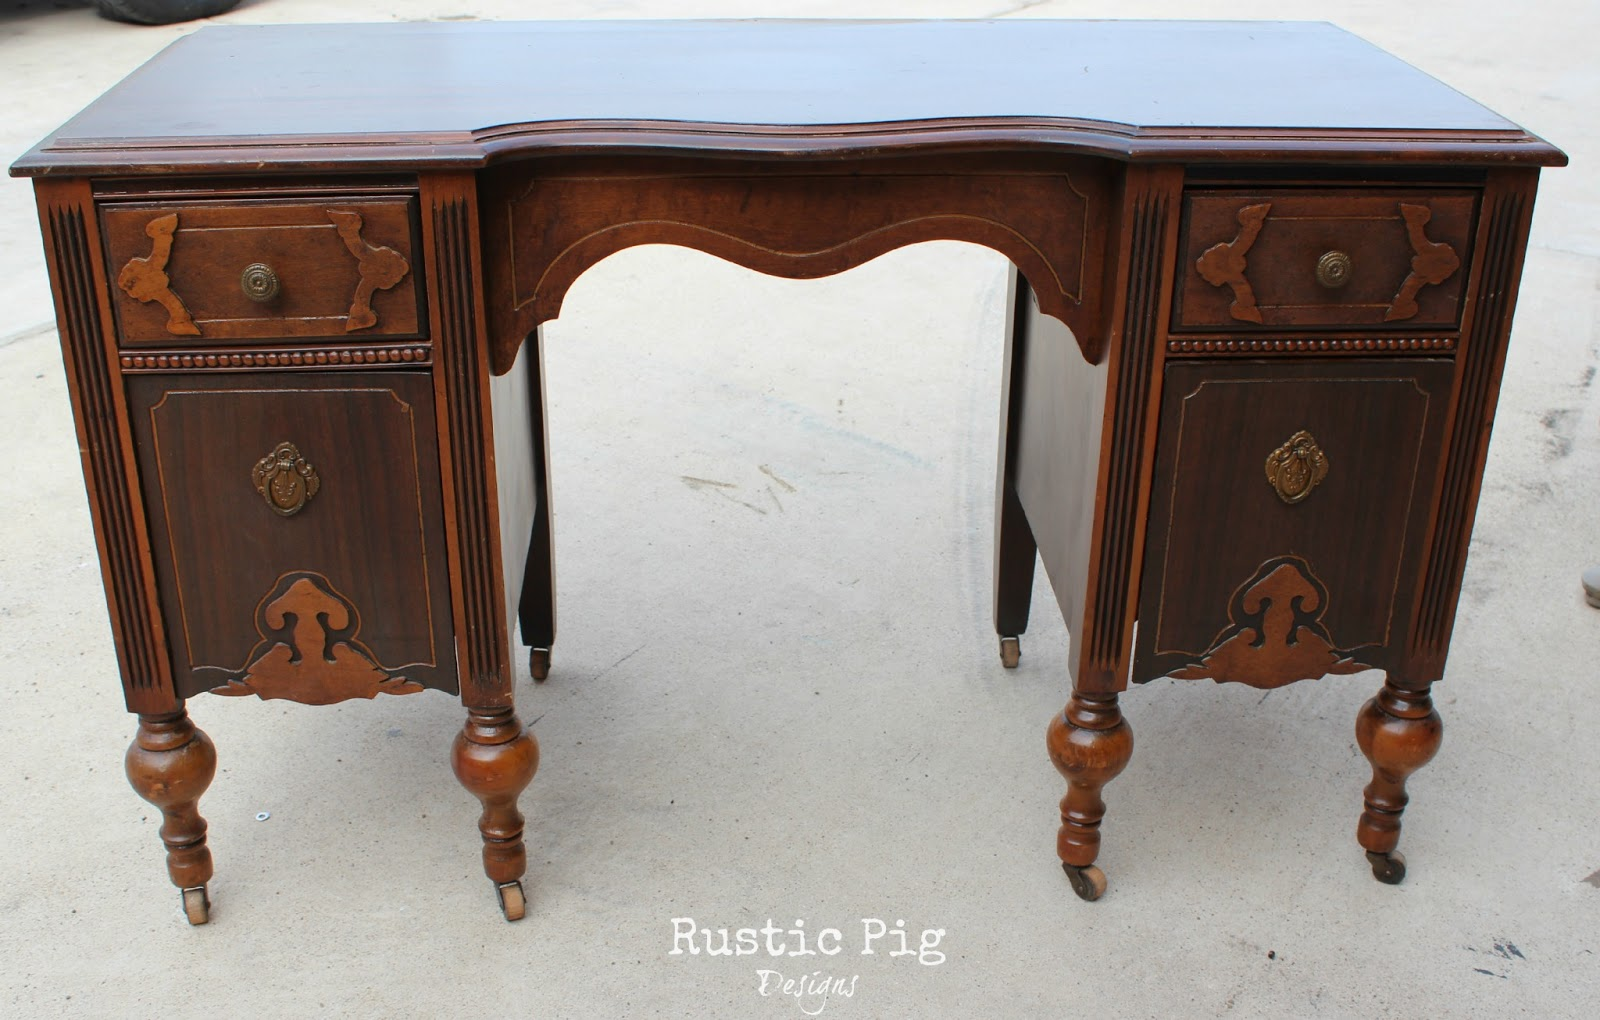 Excellent Child's Desk - The Rustic Pig NT91